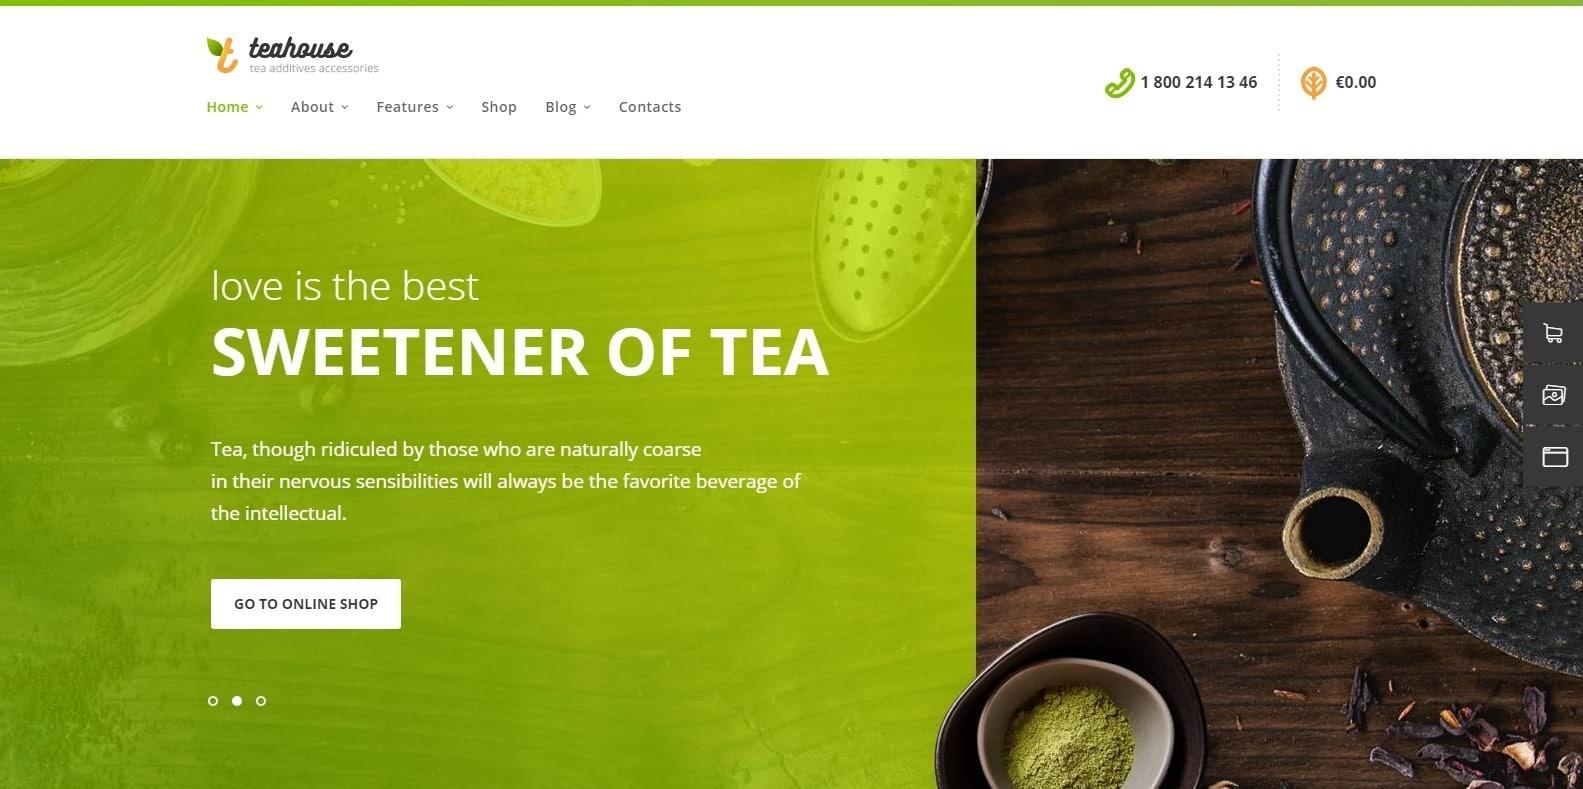 teahouse-coffee-shop-website-template